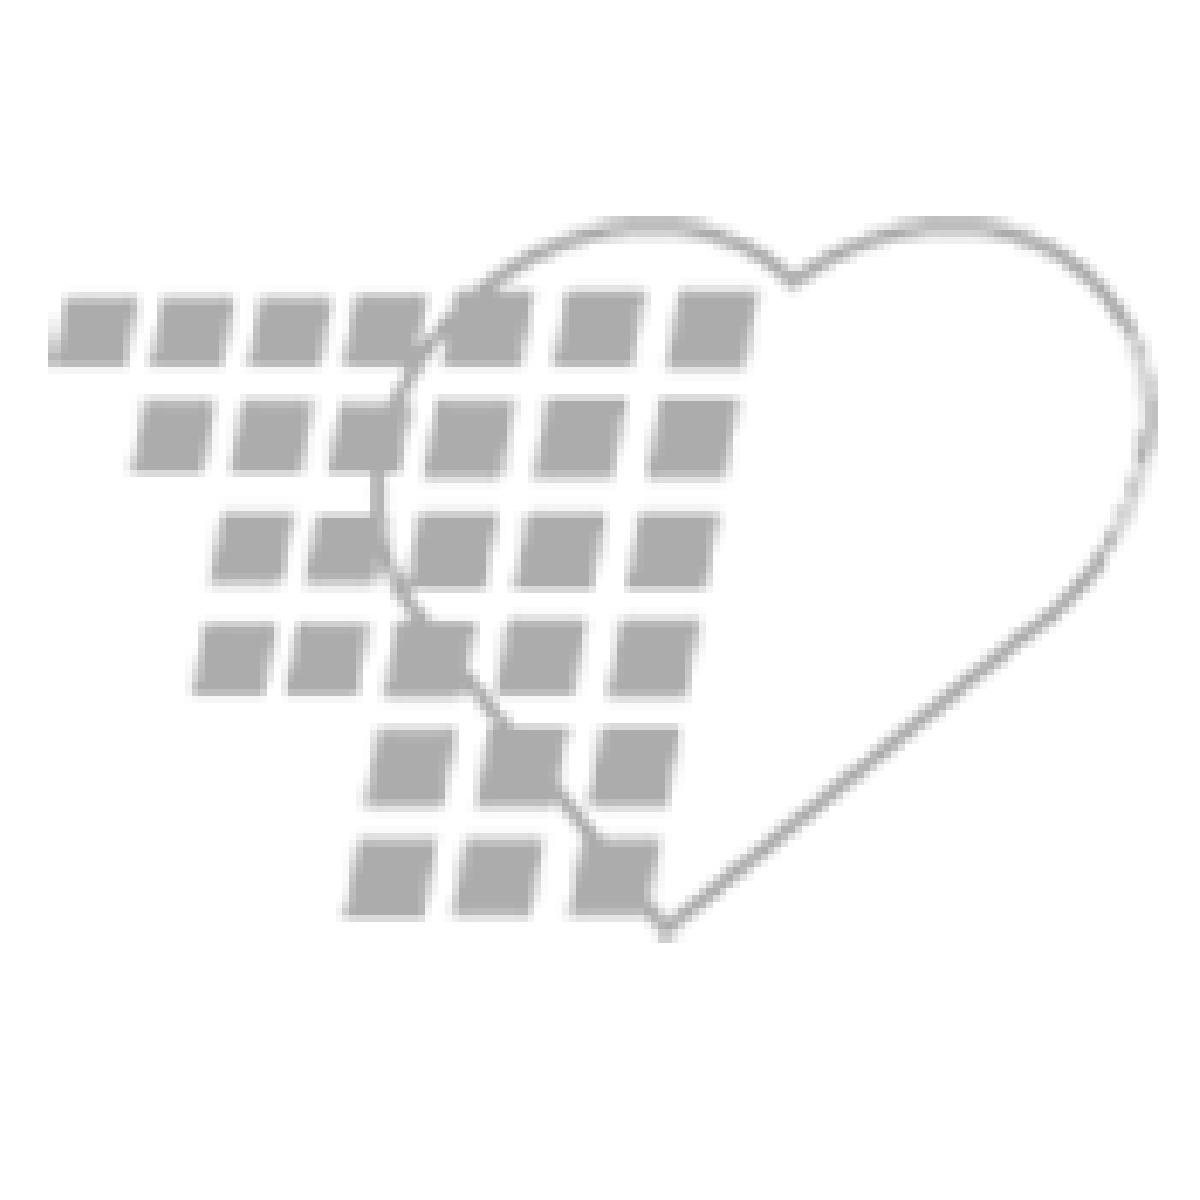 11-81-1230 - Life/form® Cervical Exam and Pap Smear Test Trainer - Light